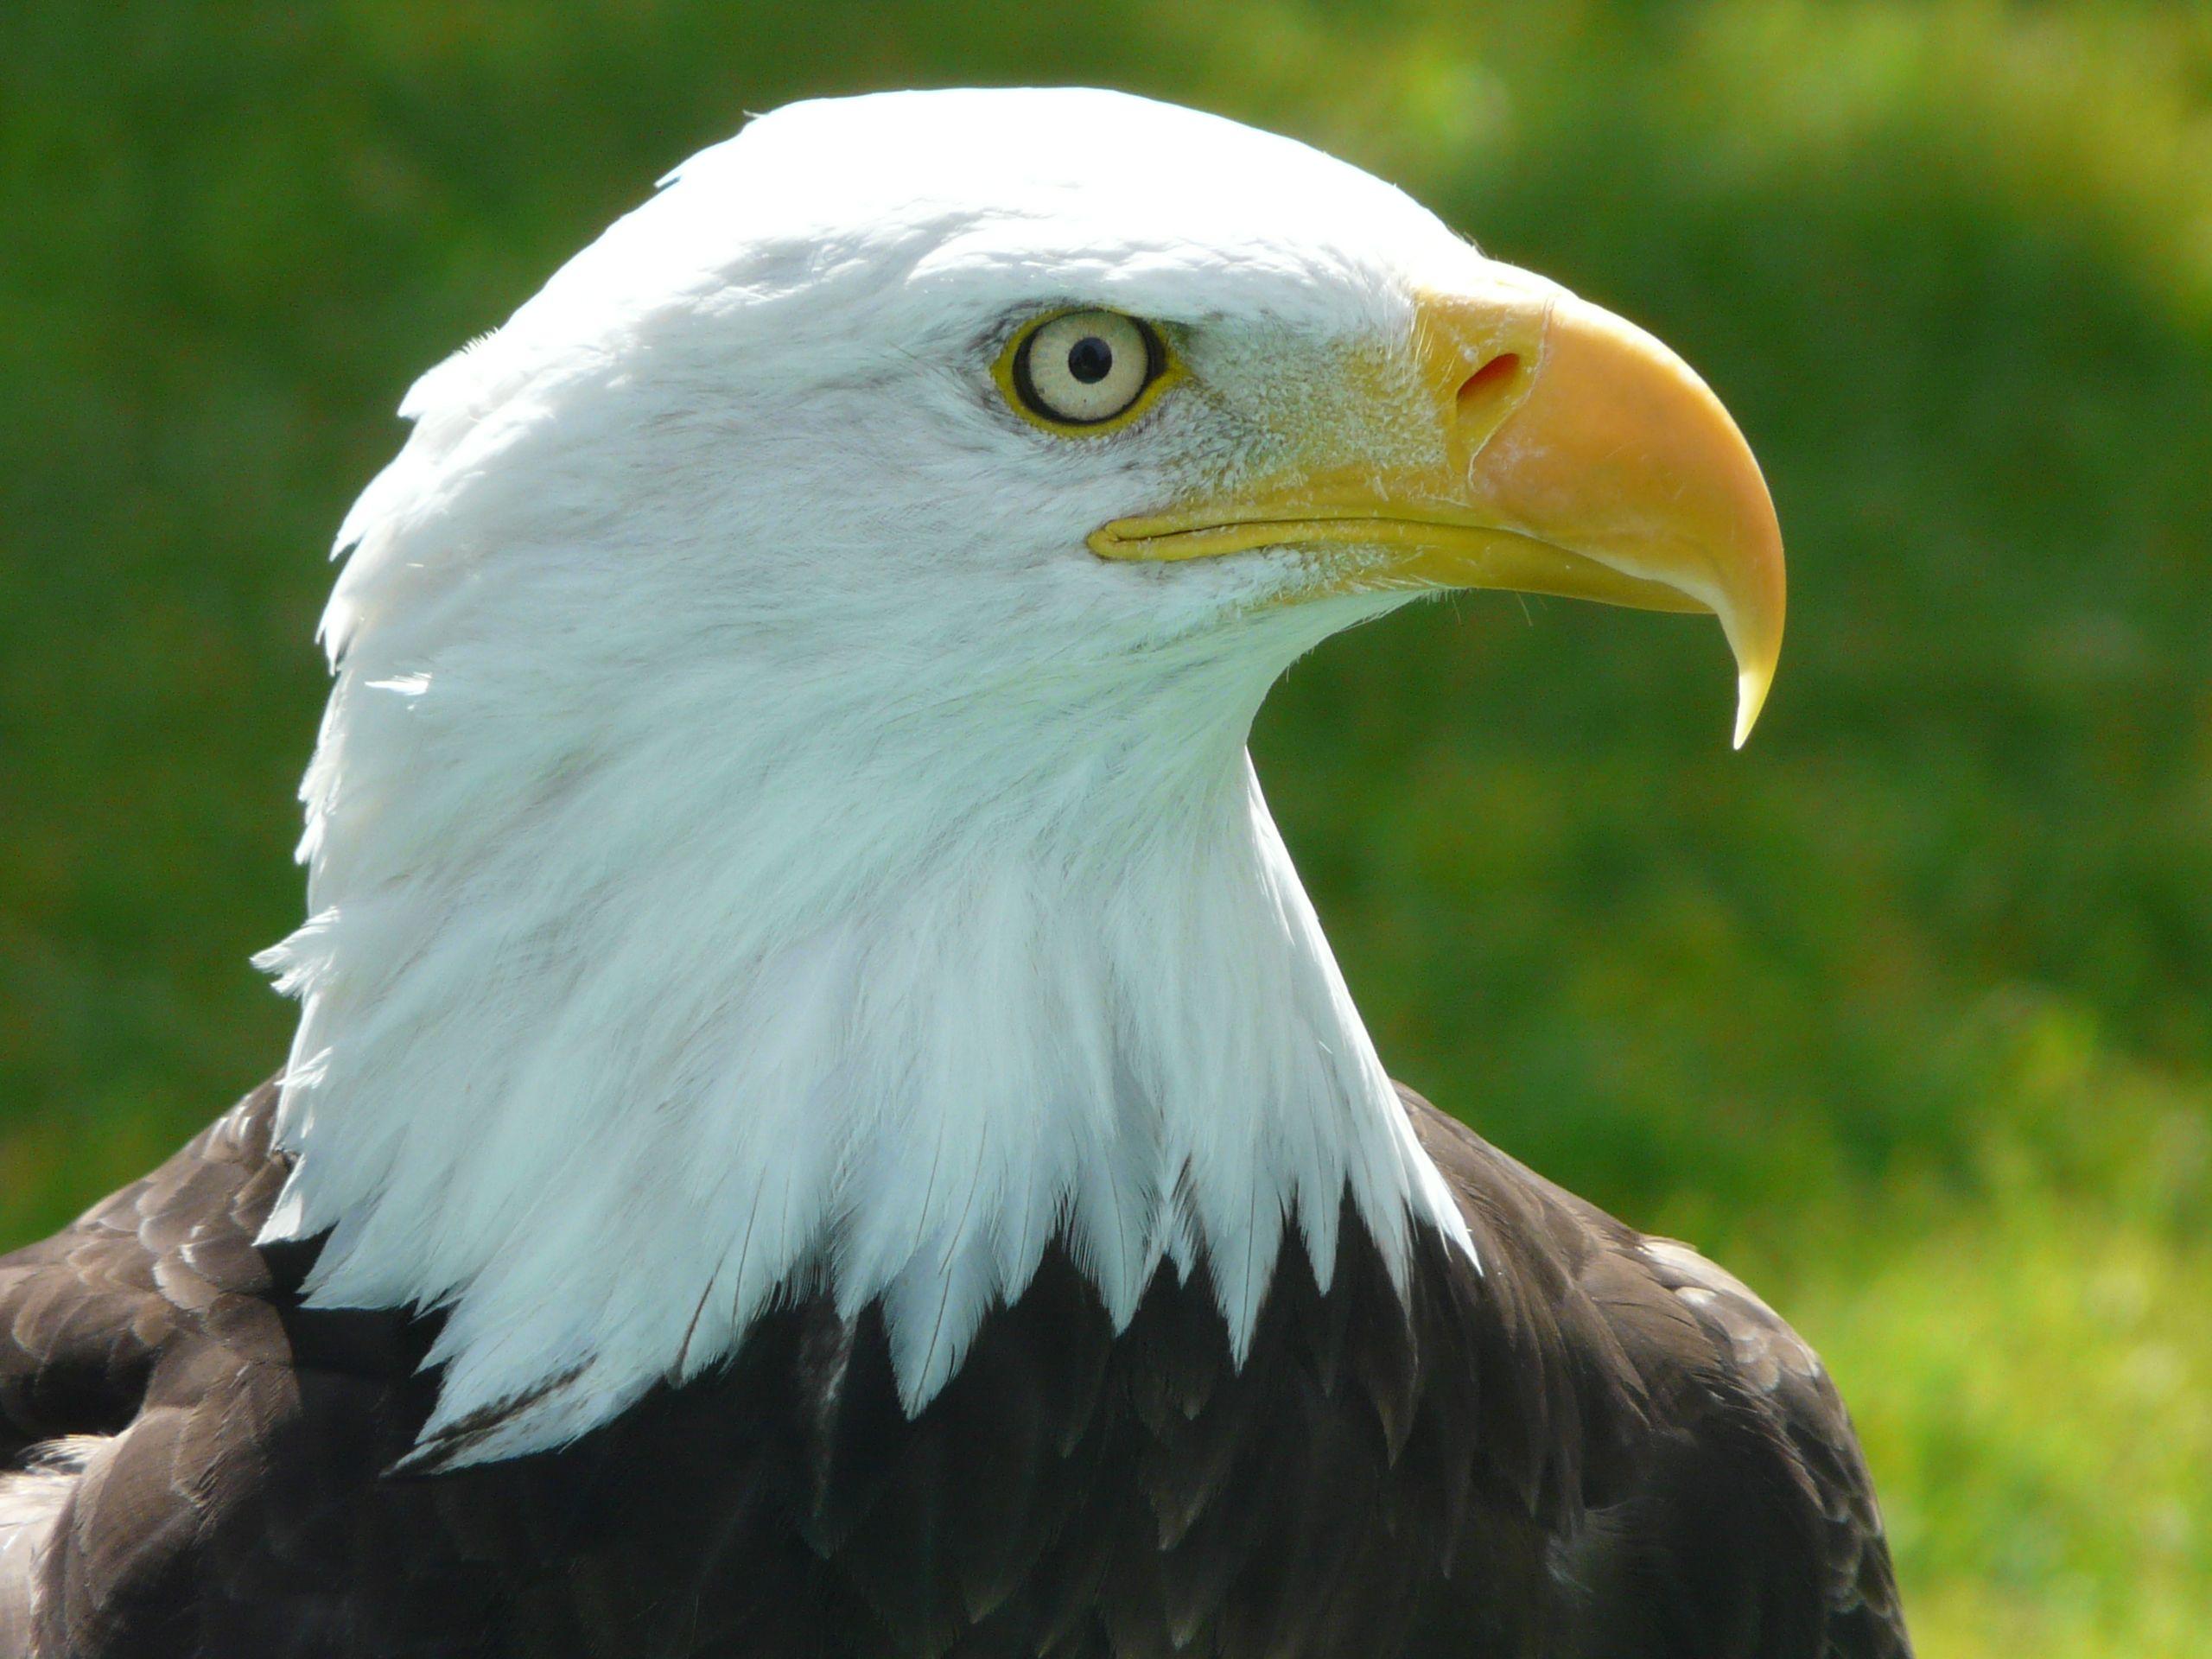 Largest bird of prey ever - photo#23